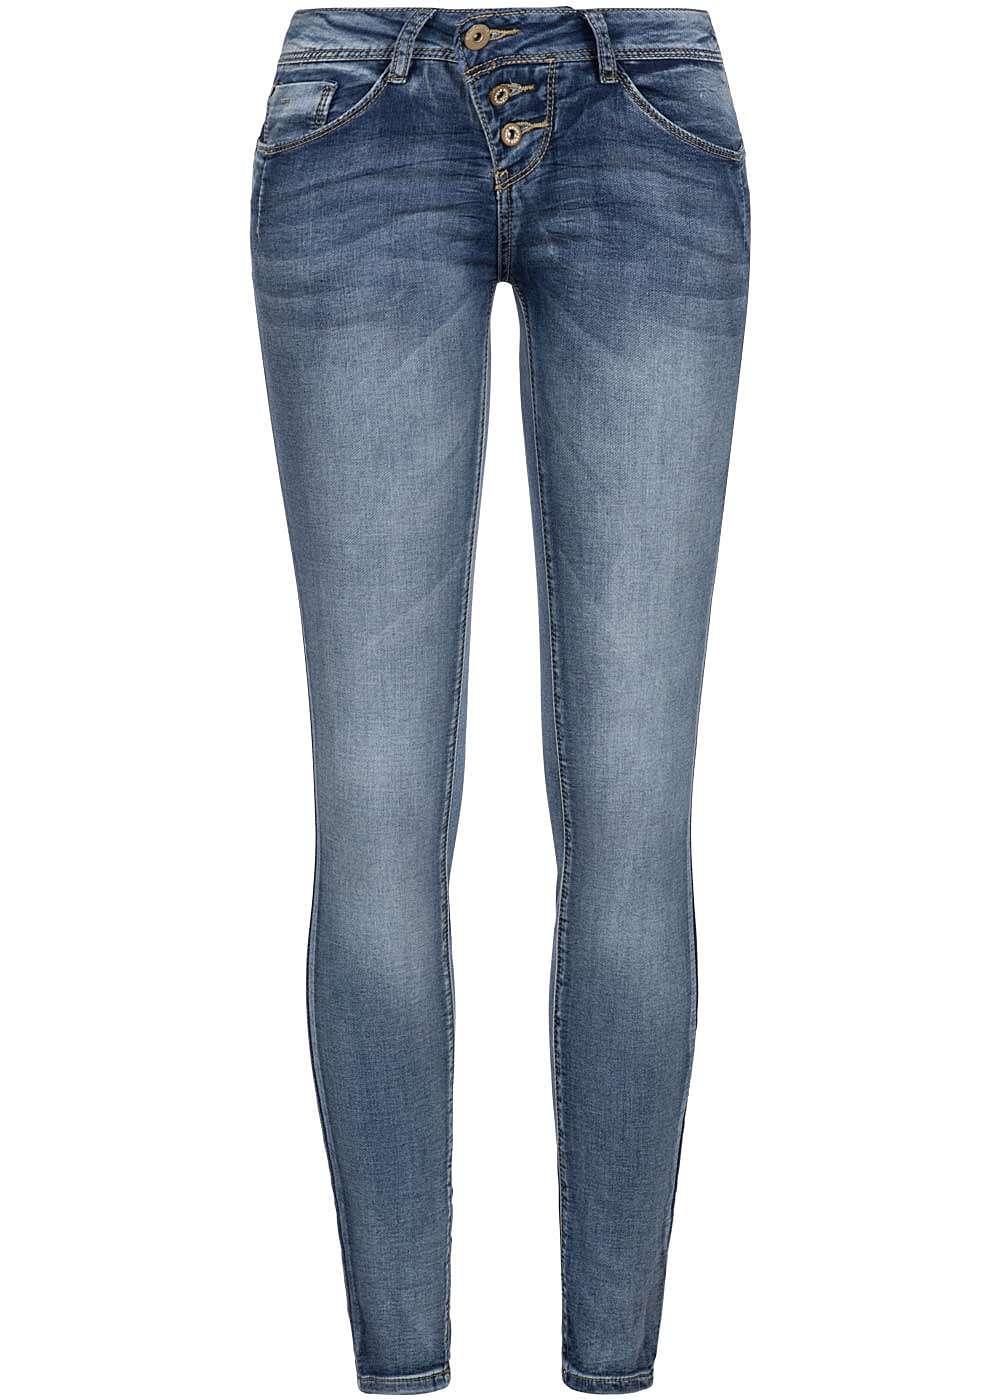 jeans ohne stretch damen pin details zu timezone damen. Black Bedroom Furniture Sets. Home Design Ideas